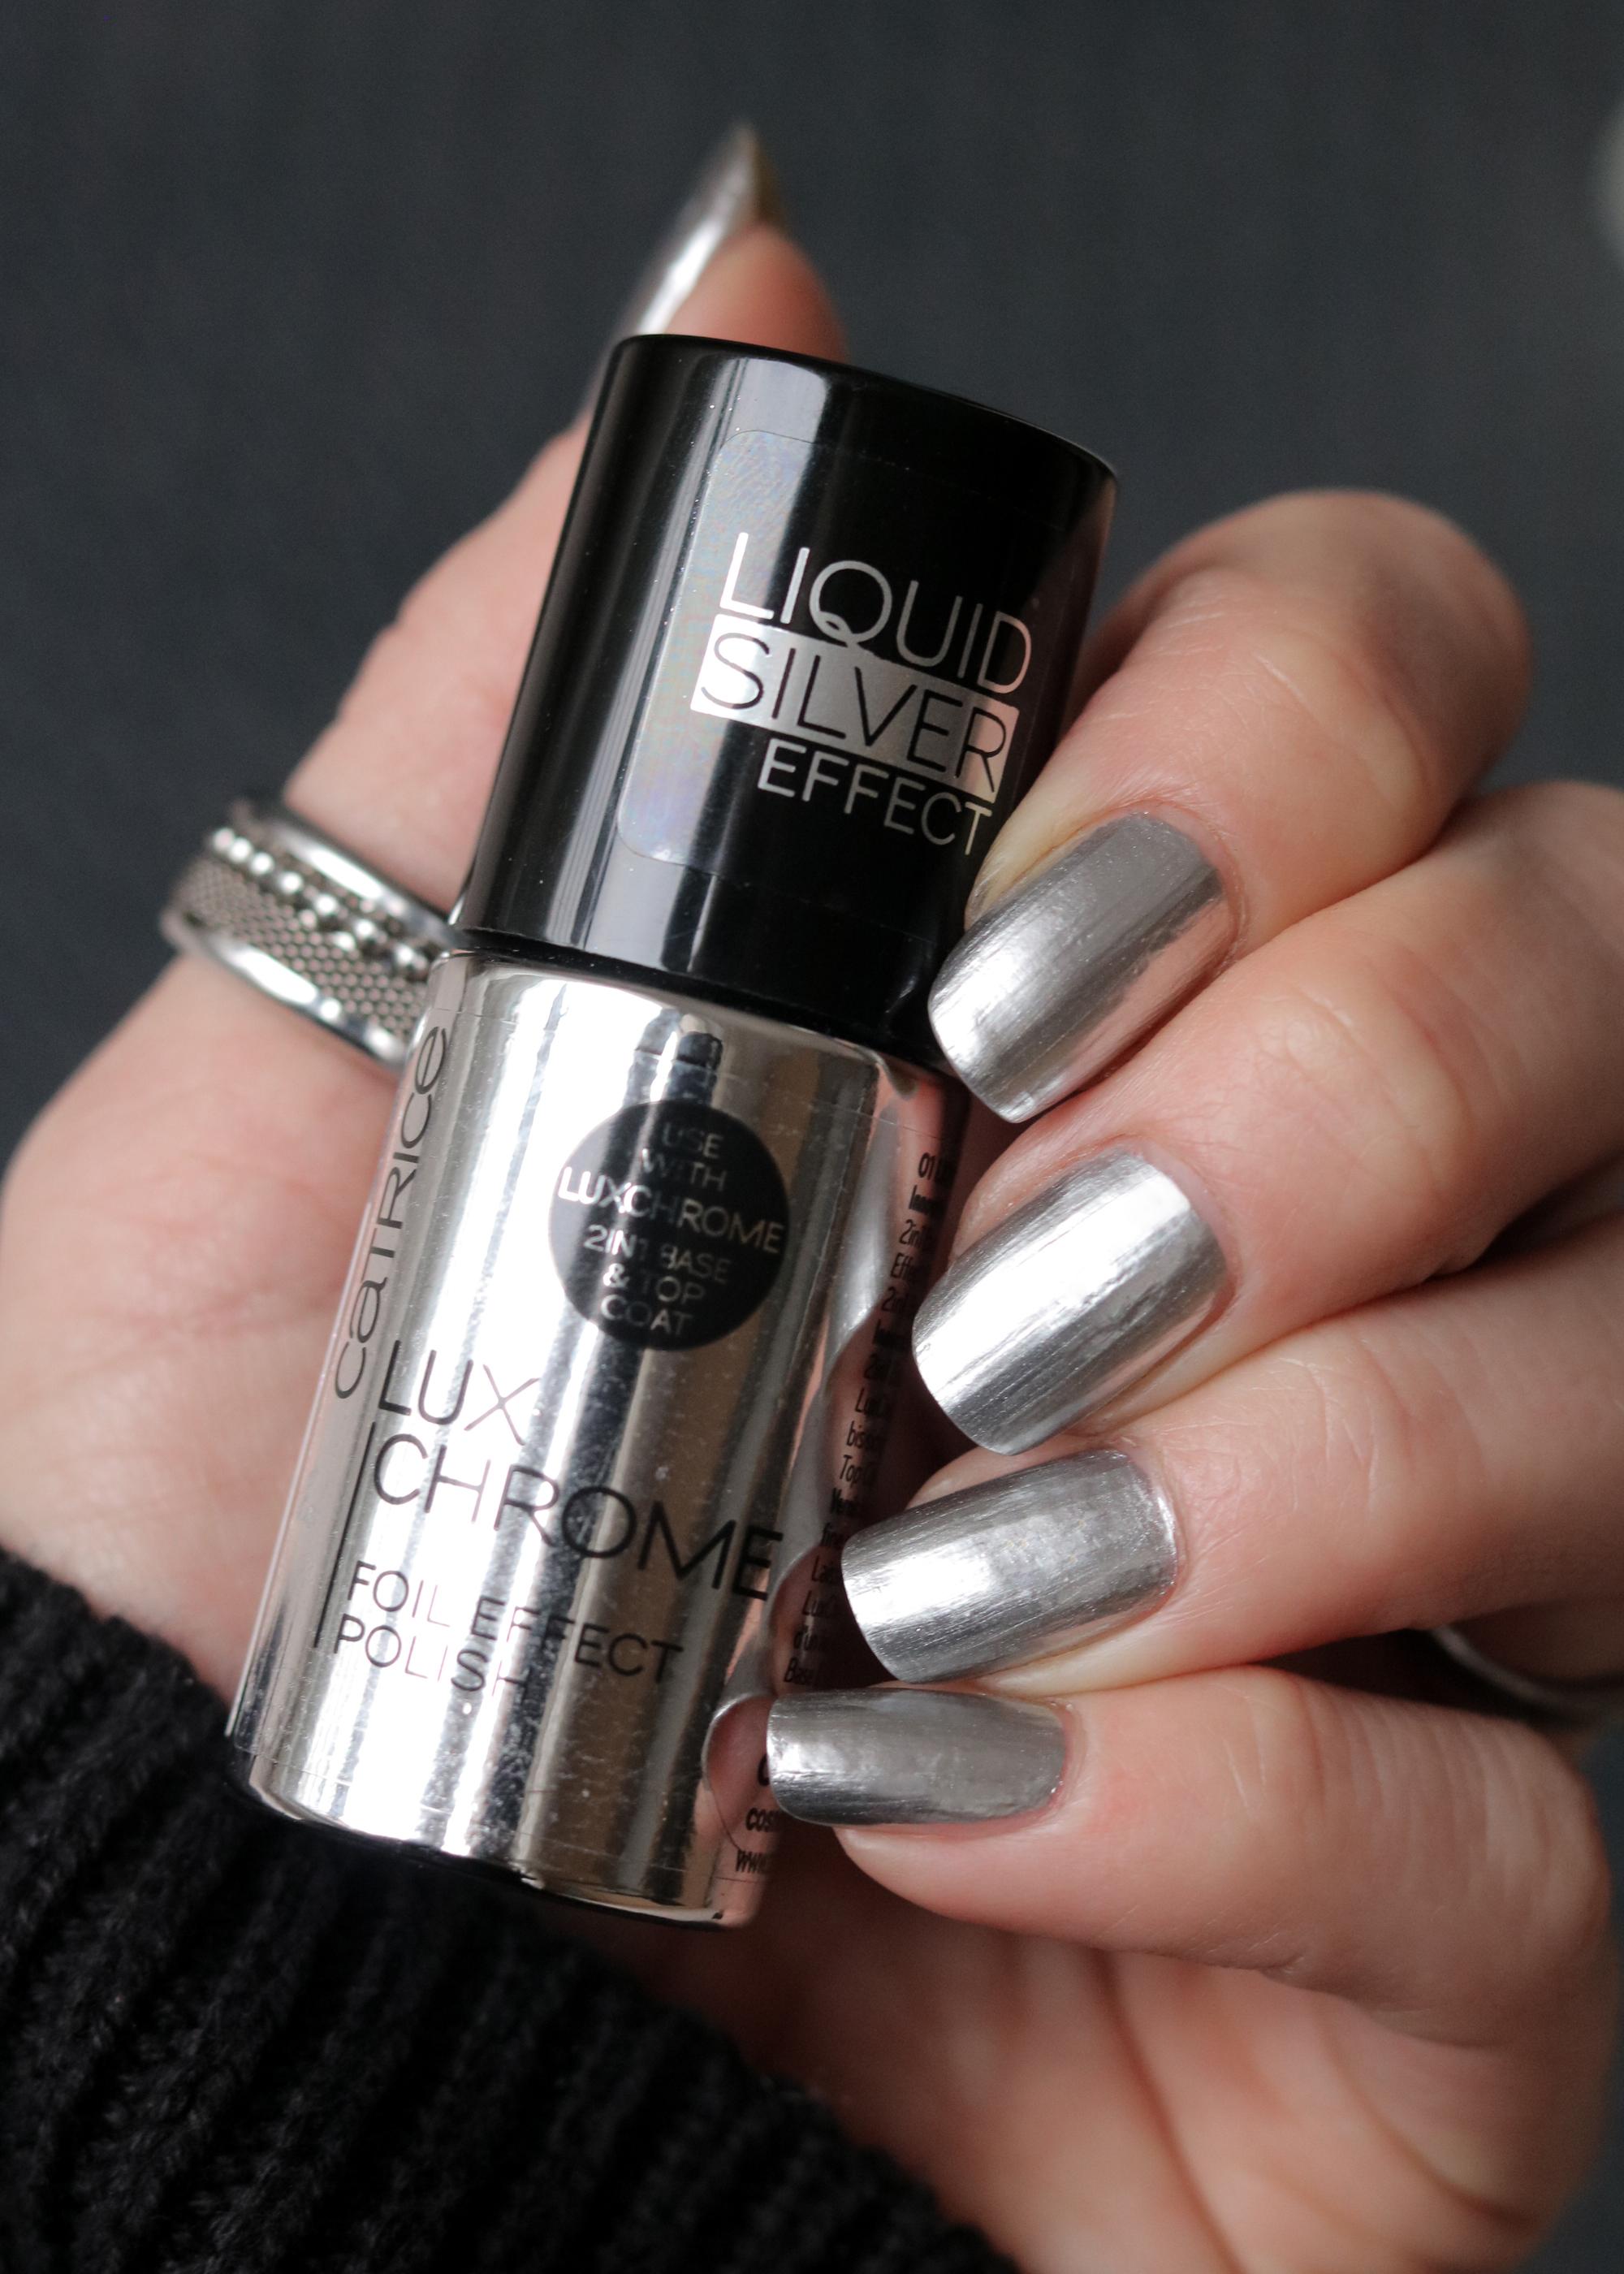 Catrice Neuheiten 2018 Lux Chrome Nagellack Metallic Silber Swatch - Lavie Deboite